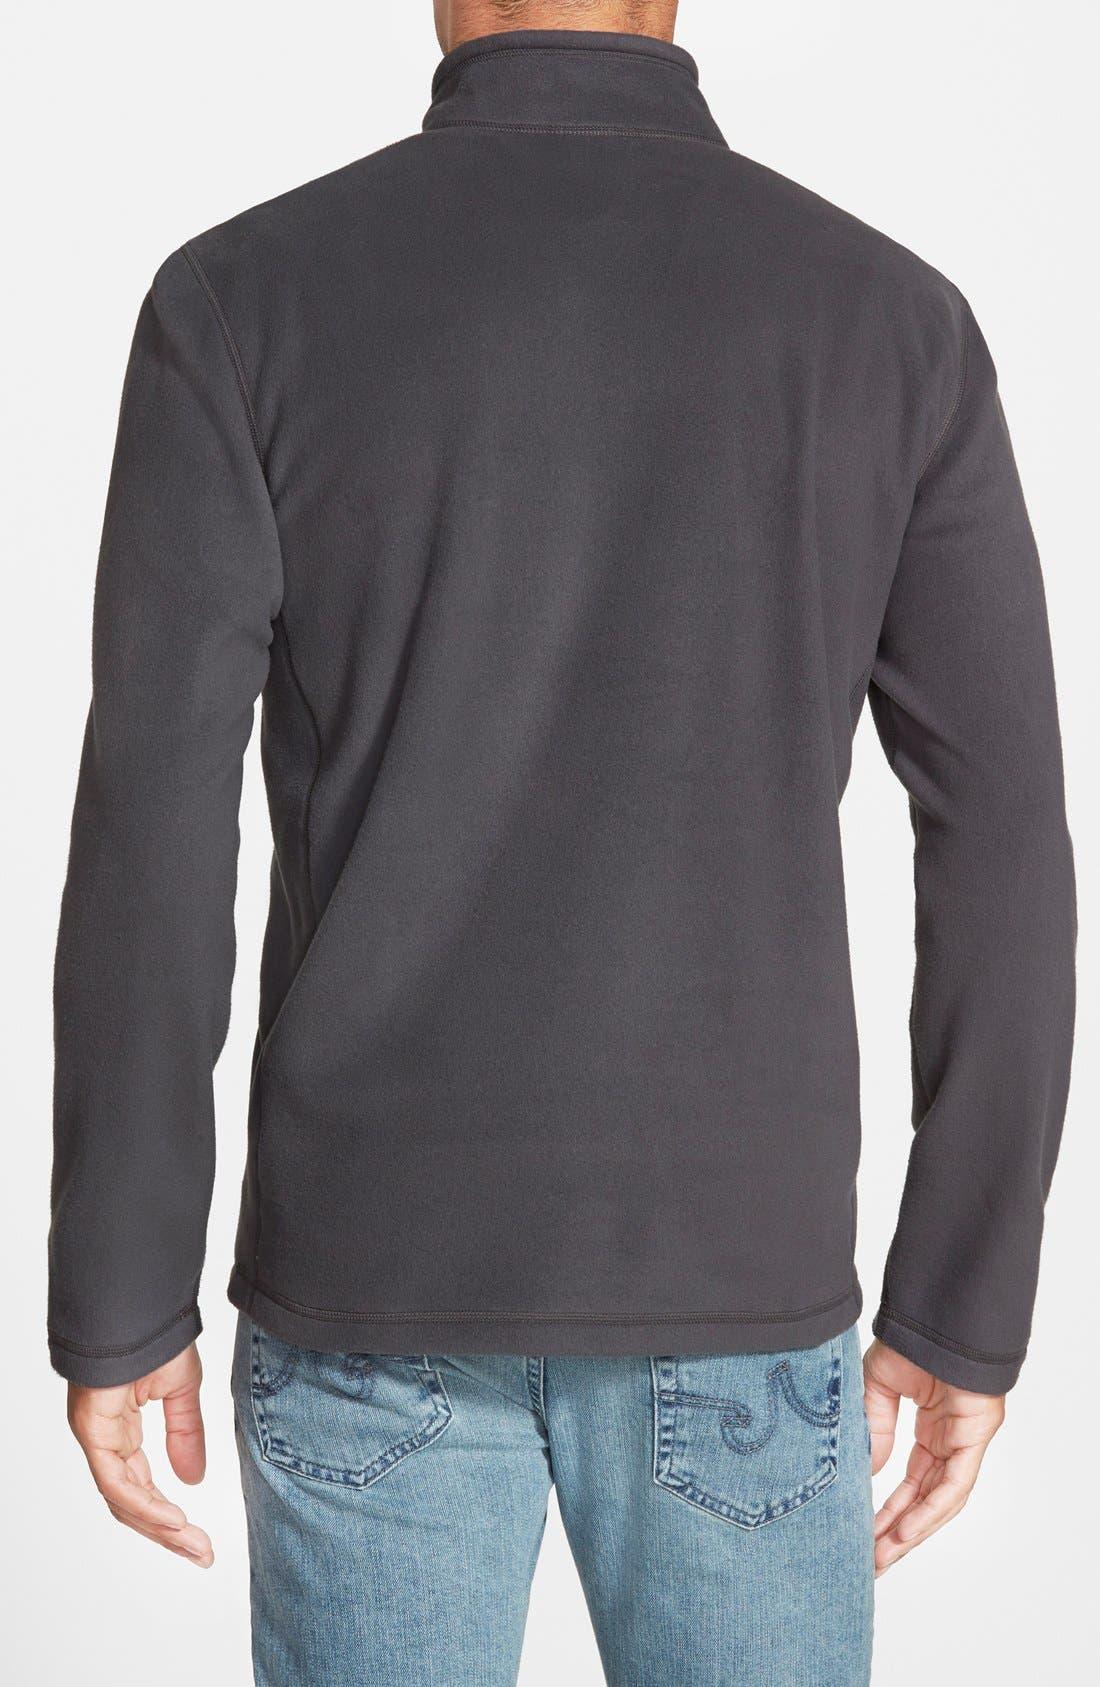 'TKA 100 Glacier' Quarter Zip Fleece Pullover,                             Alternate thumbnail 66, color,